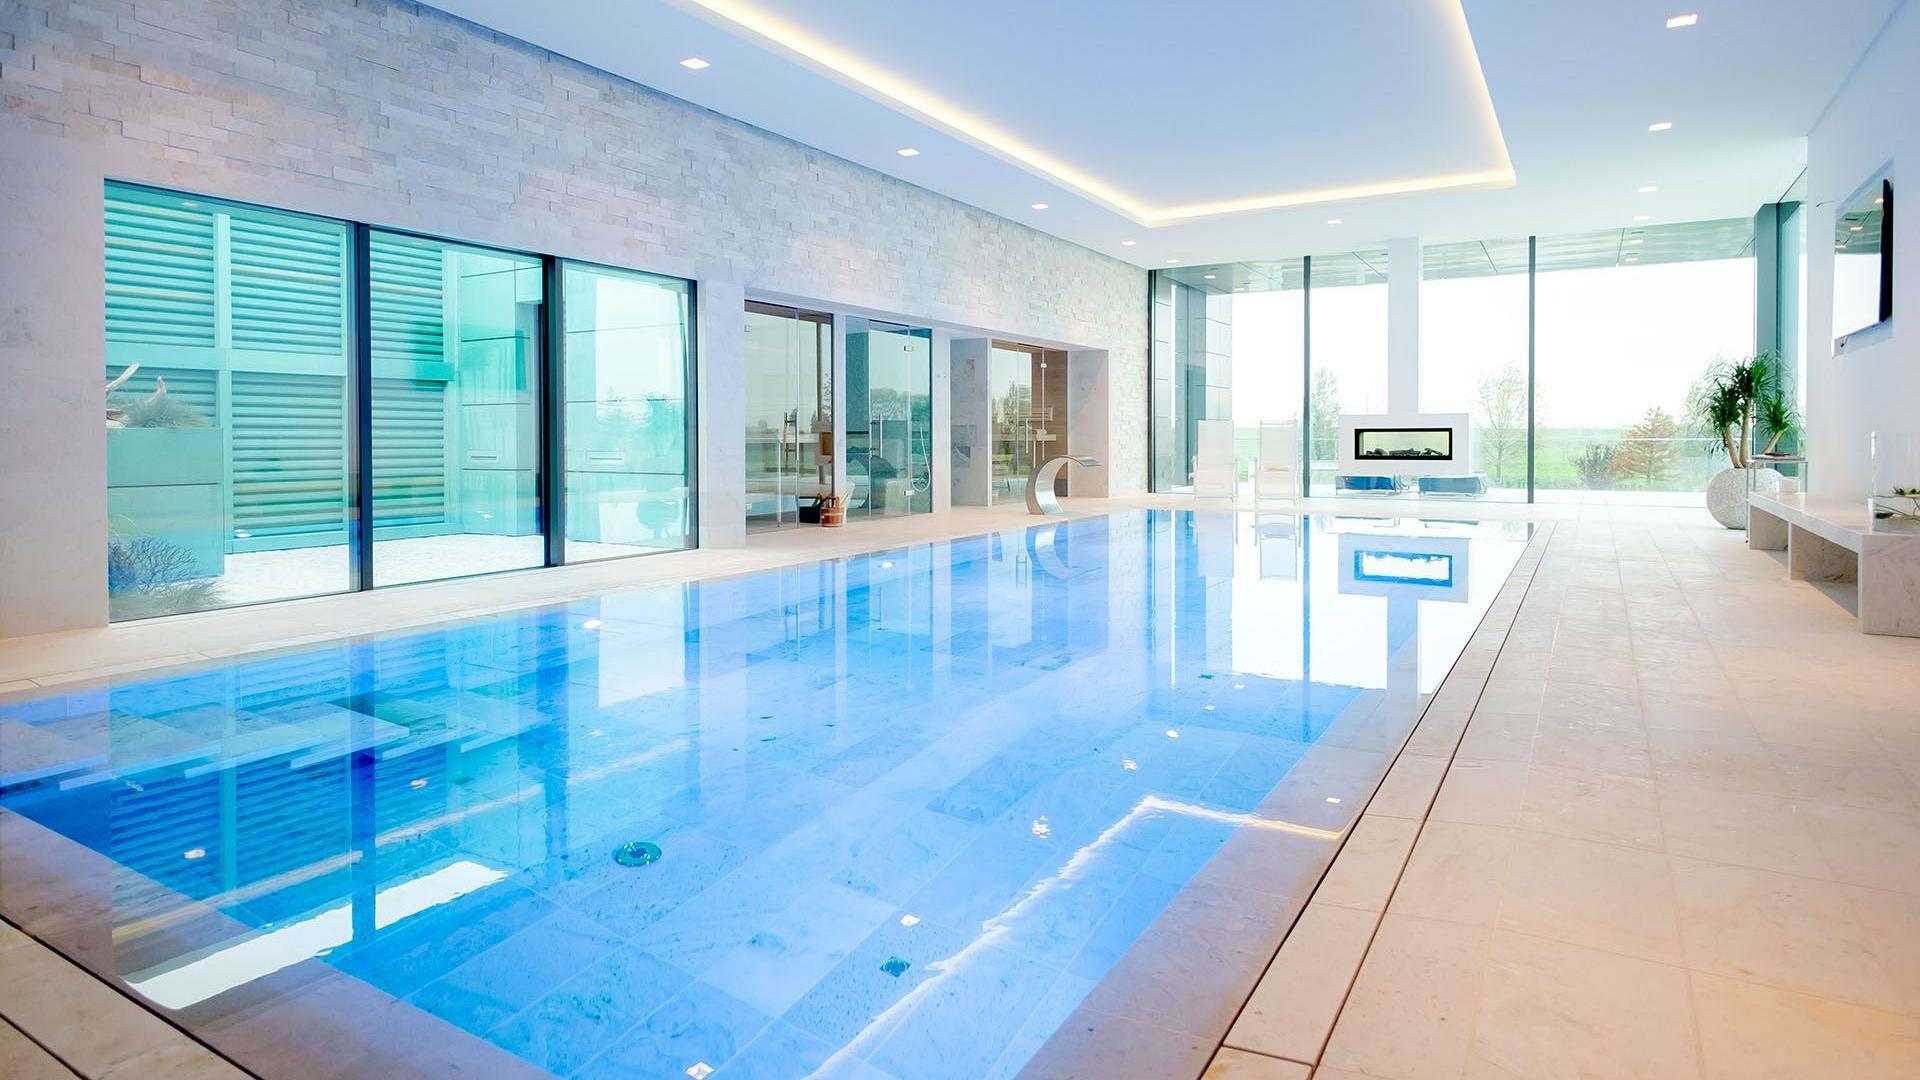 architekt f r haus schwimmbad wellness spa. Black Bedroom Furniture Sets. Home Design Ideas